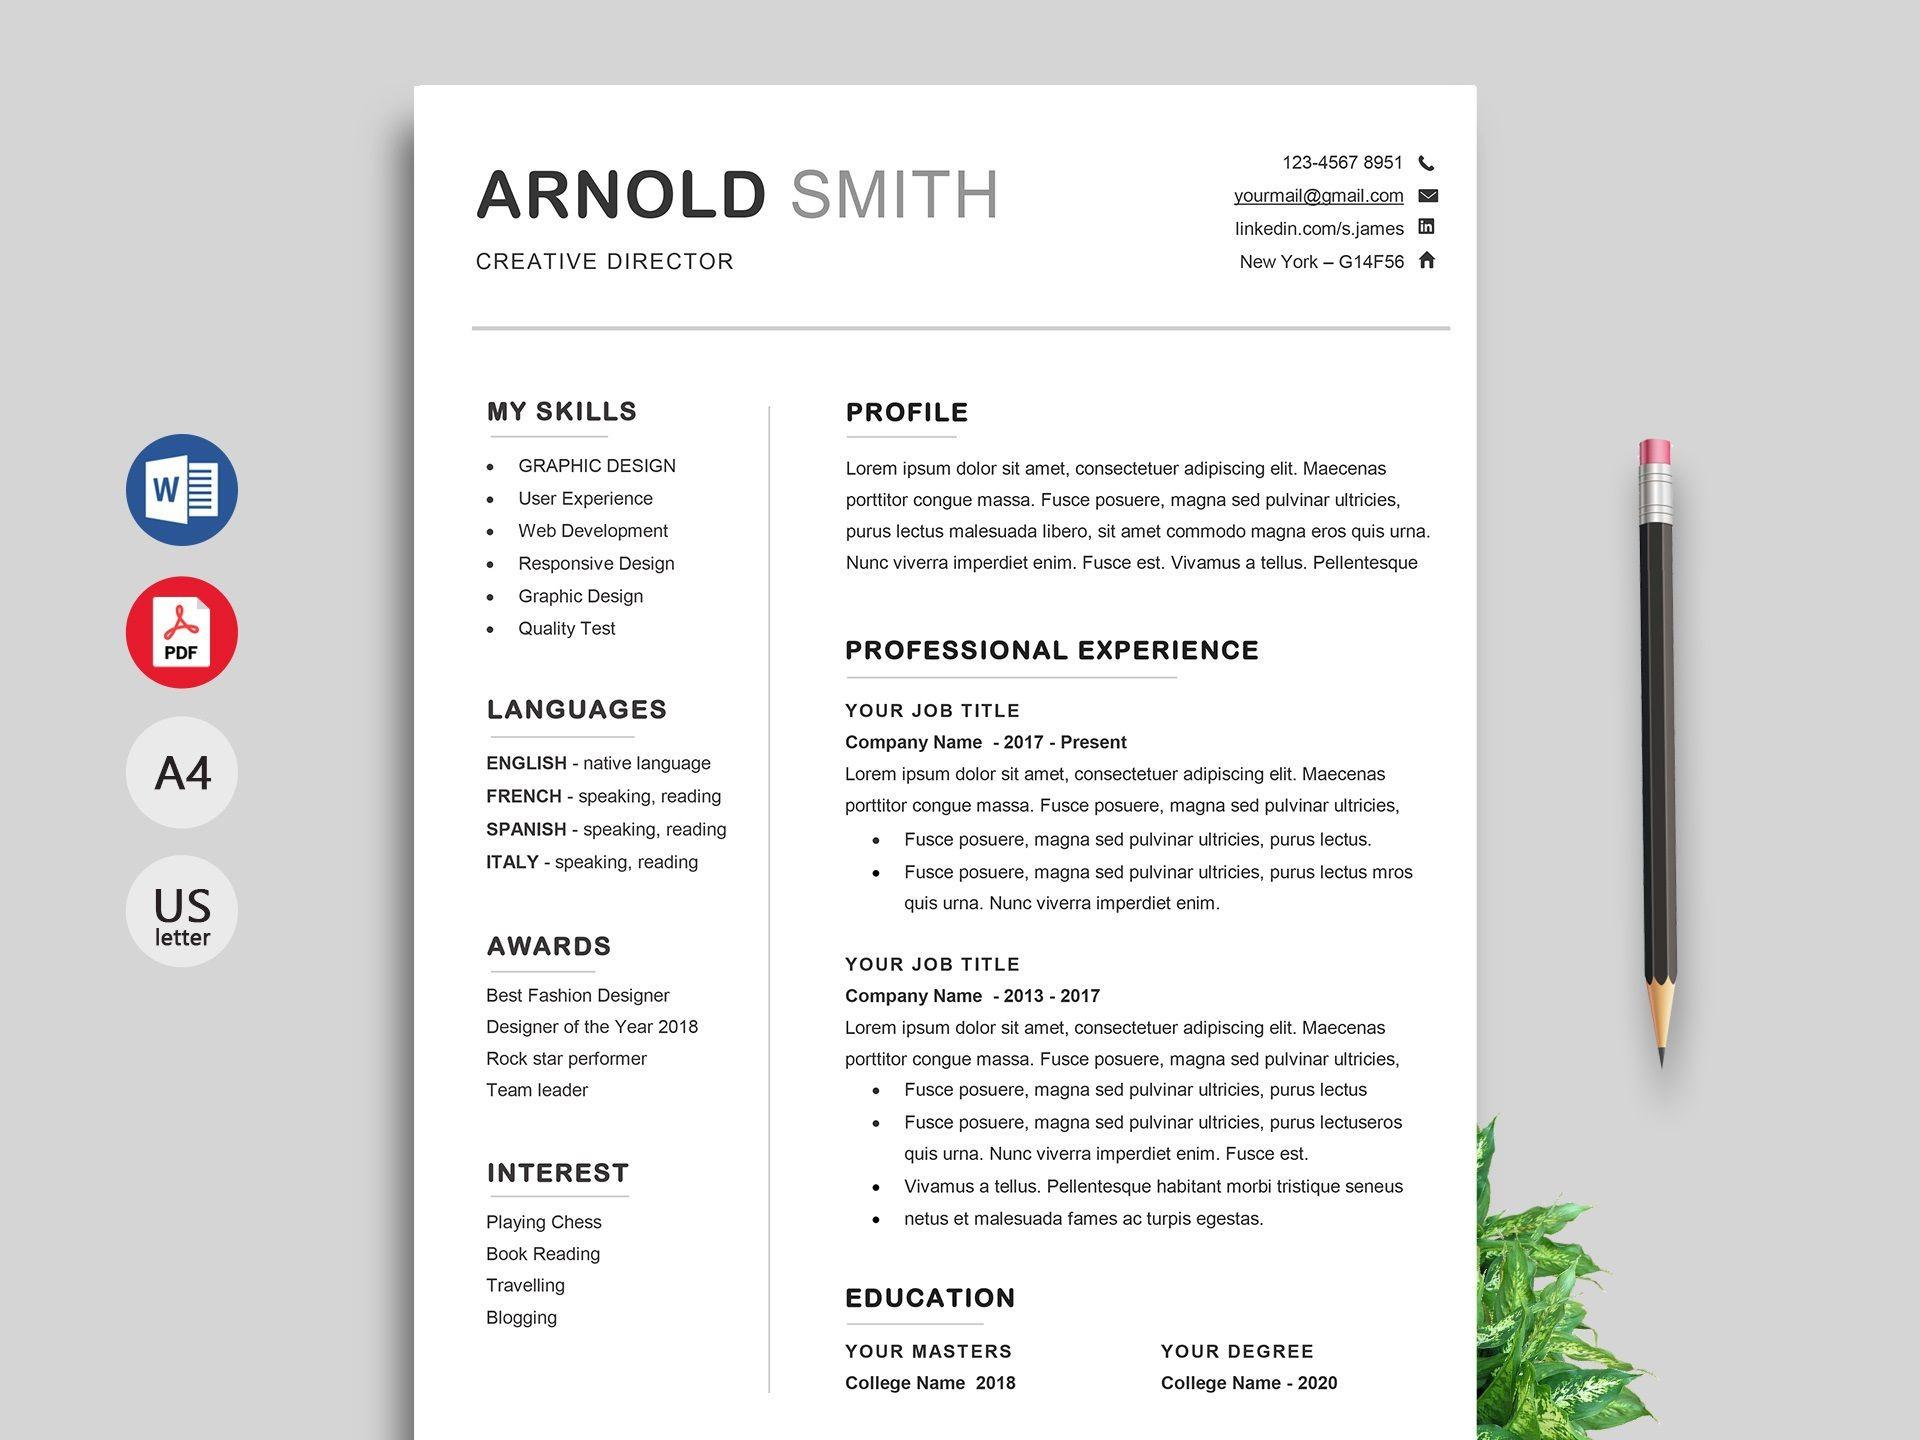 003 Impressive Creative Resume Template Free Download Photo  For Microsoft Word Fresher Cv Doc1920